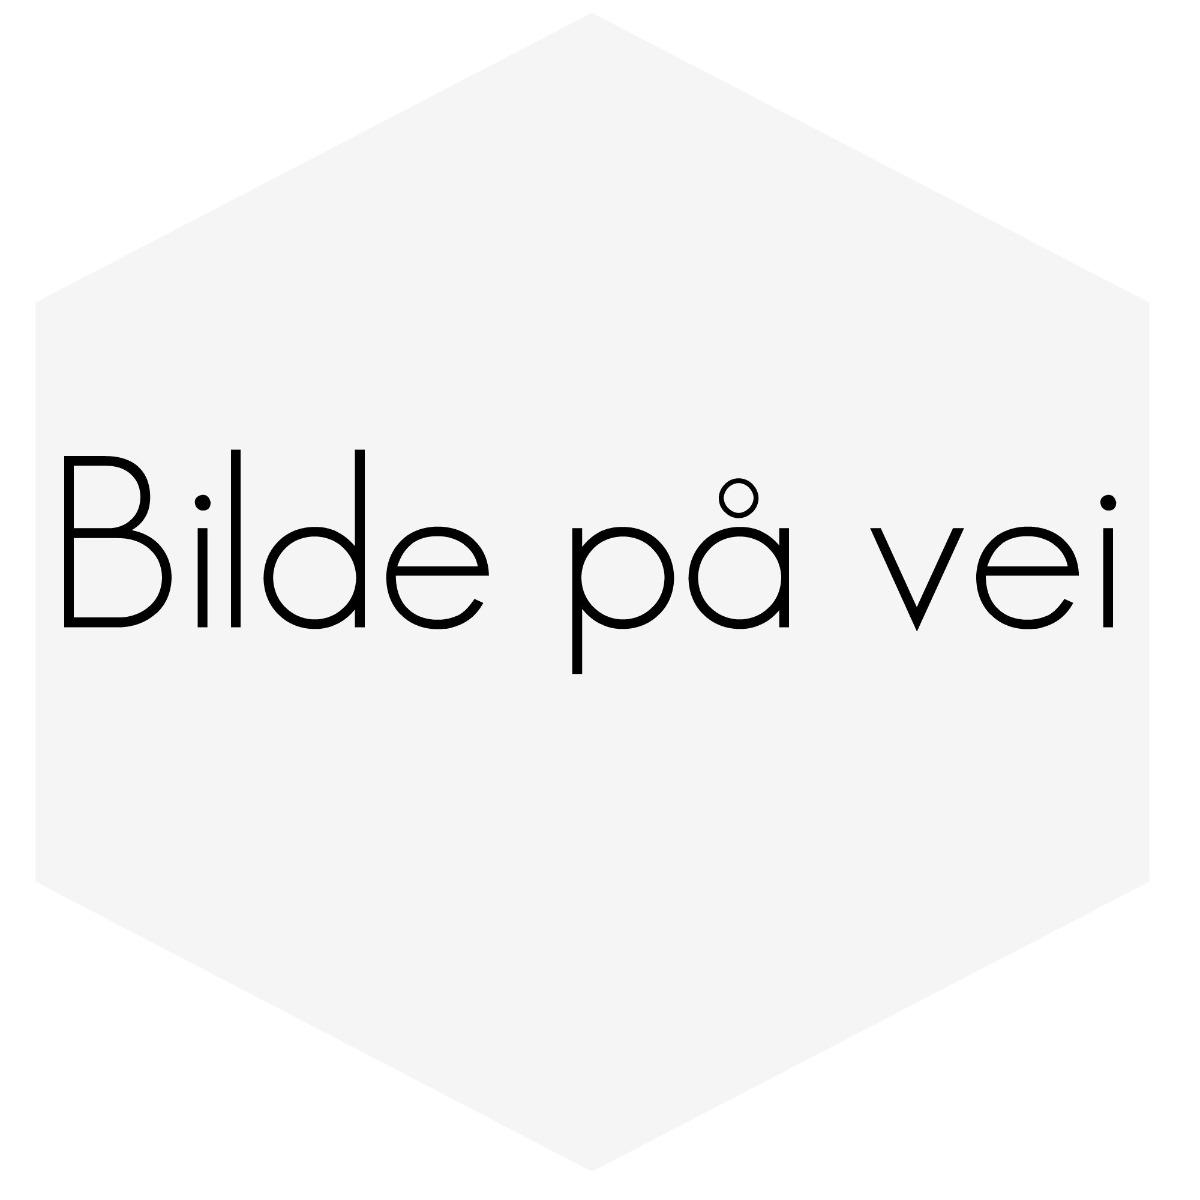 PUSSERBLAD VOLVO V70,XC70,XC60 ++ 2008>FRONTVINDU SATS MED 2